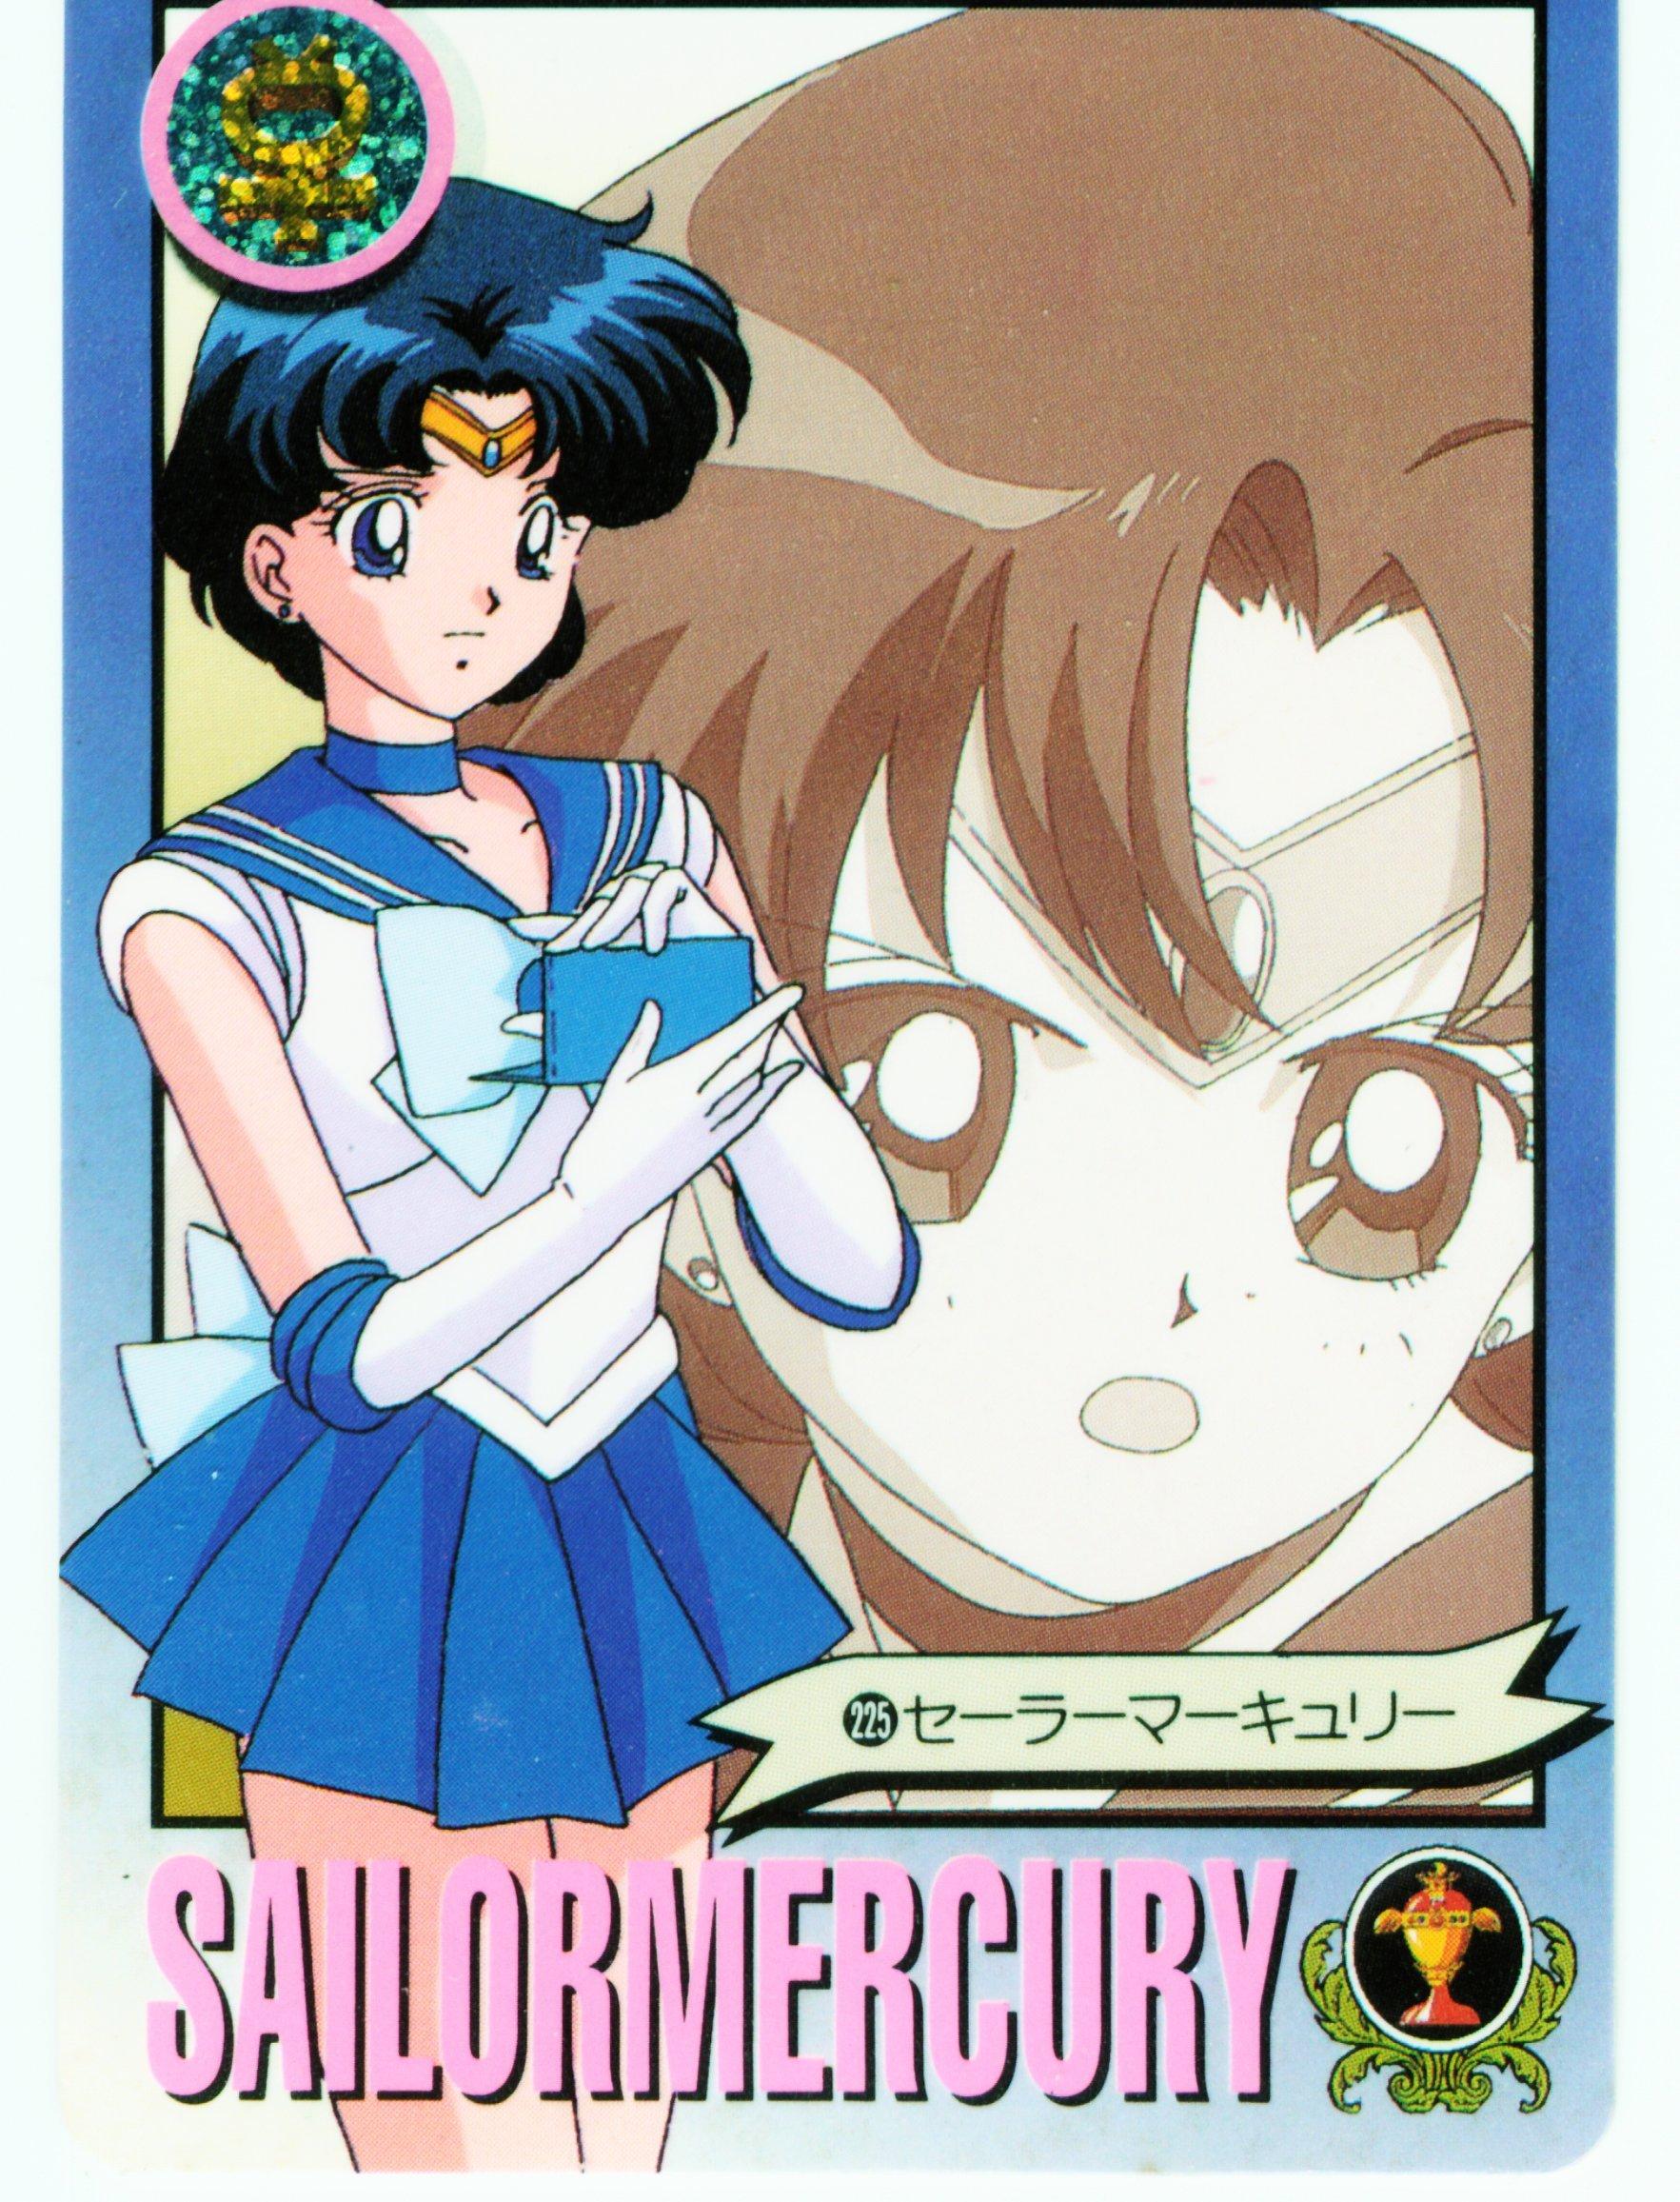 Sailor Mercury card